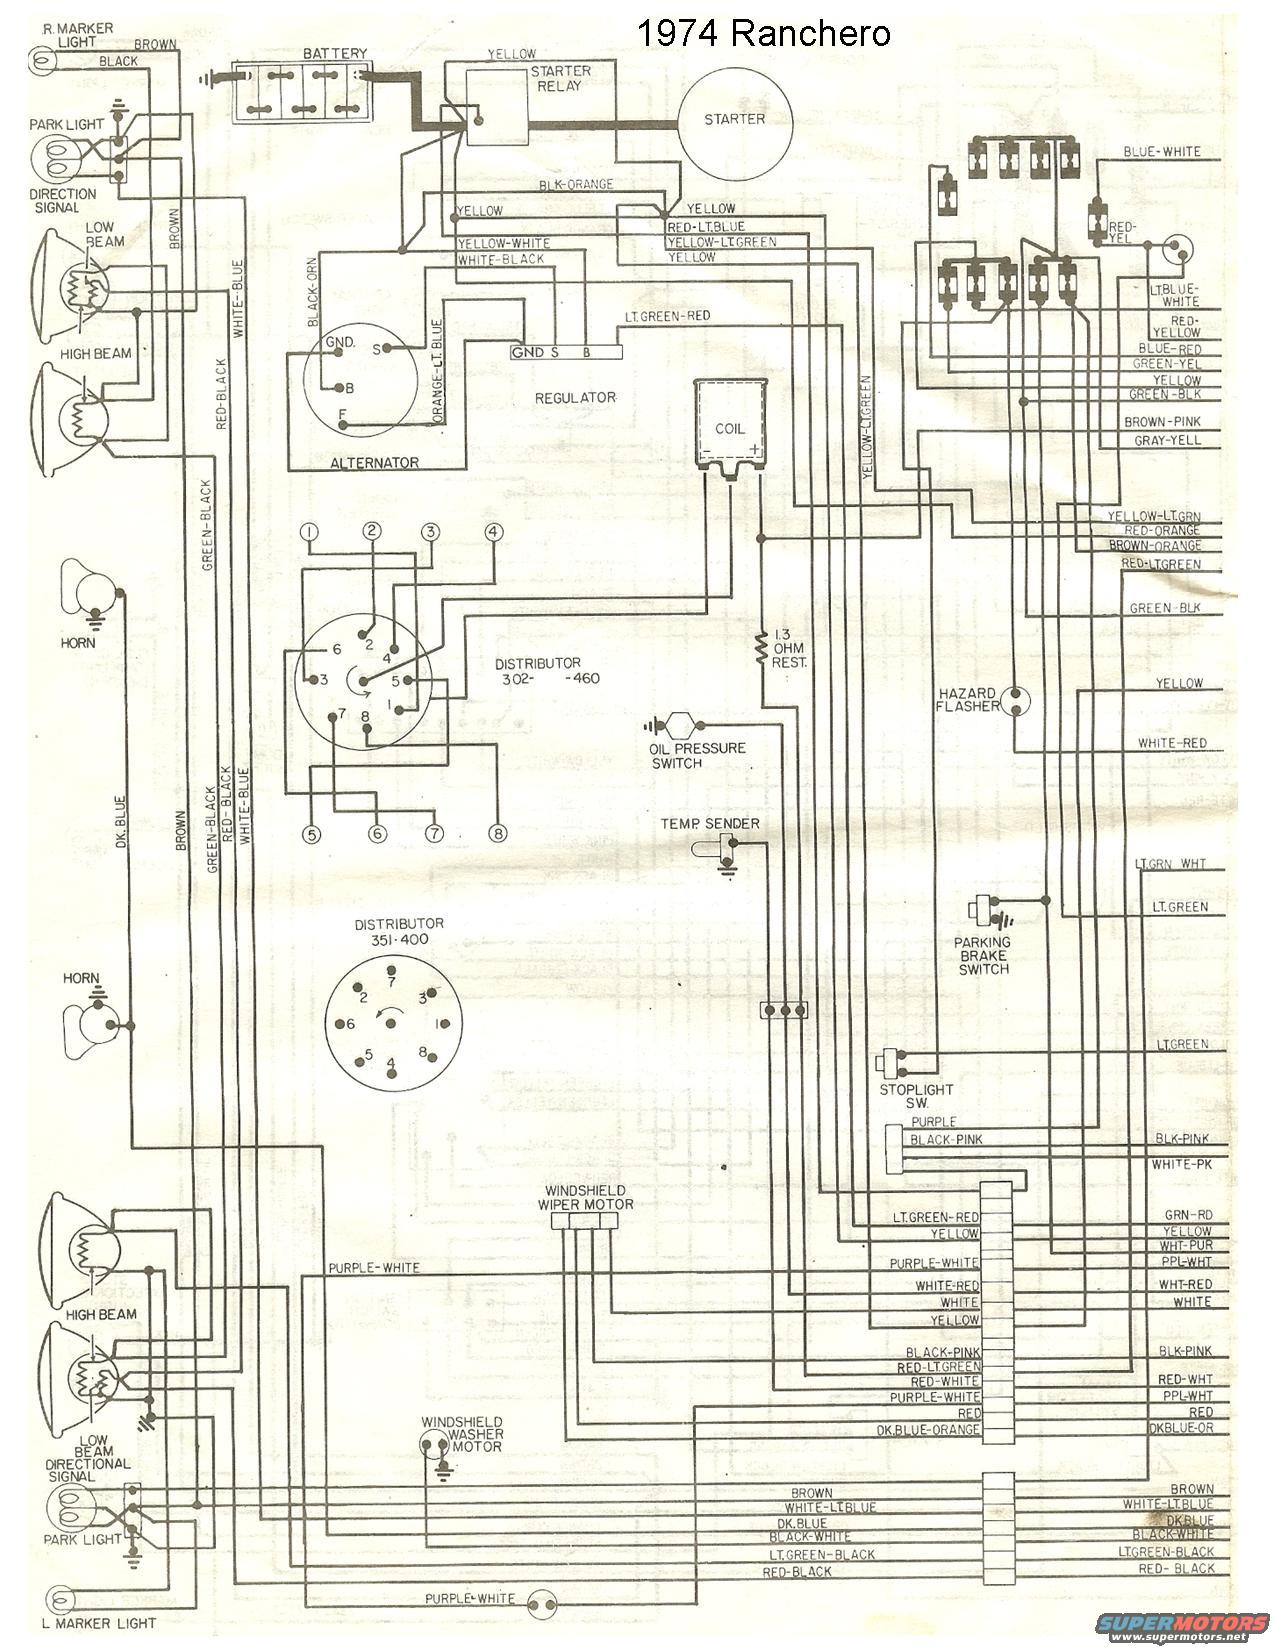 1965 ford ranchero wiring diagram emg 81 60 1971 mercury montego free engine